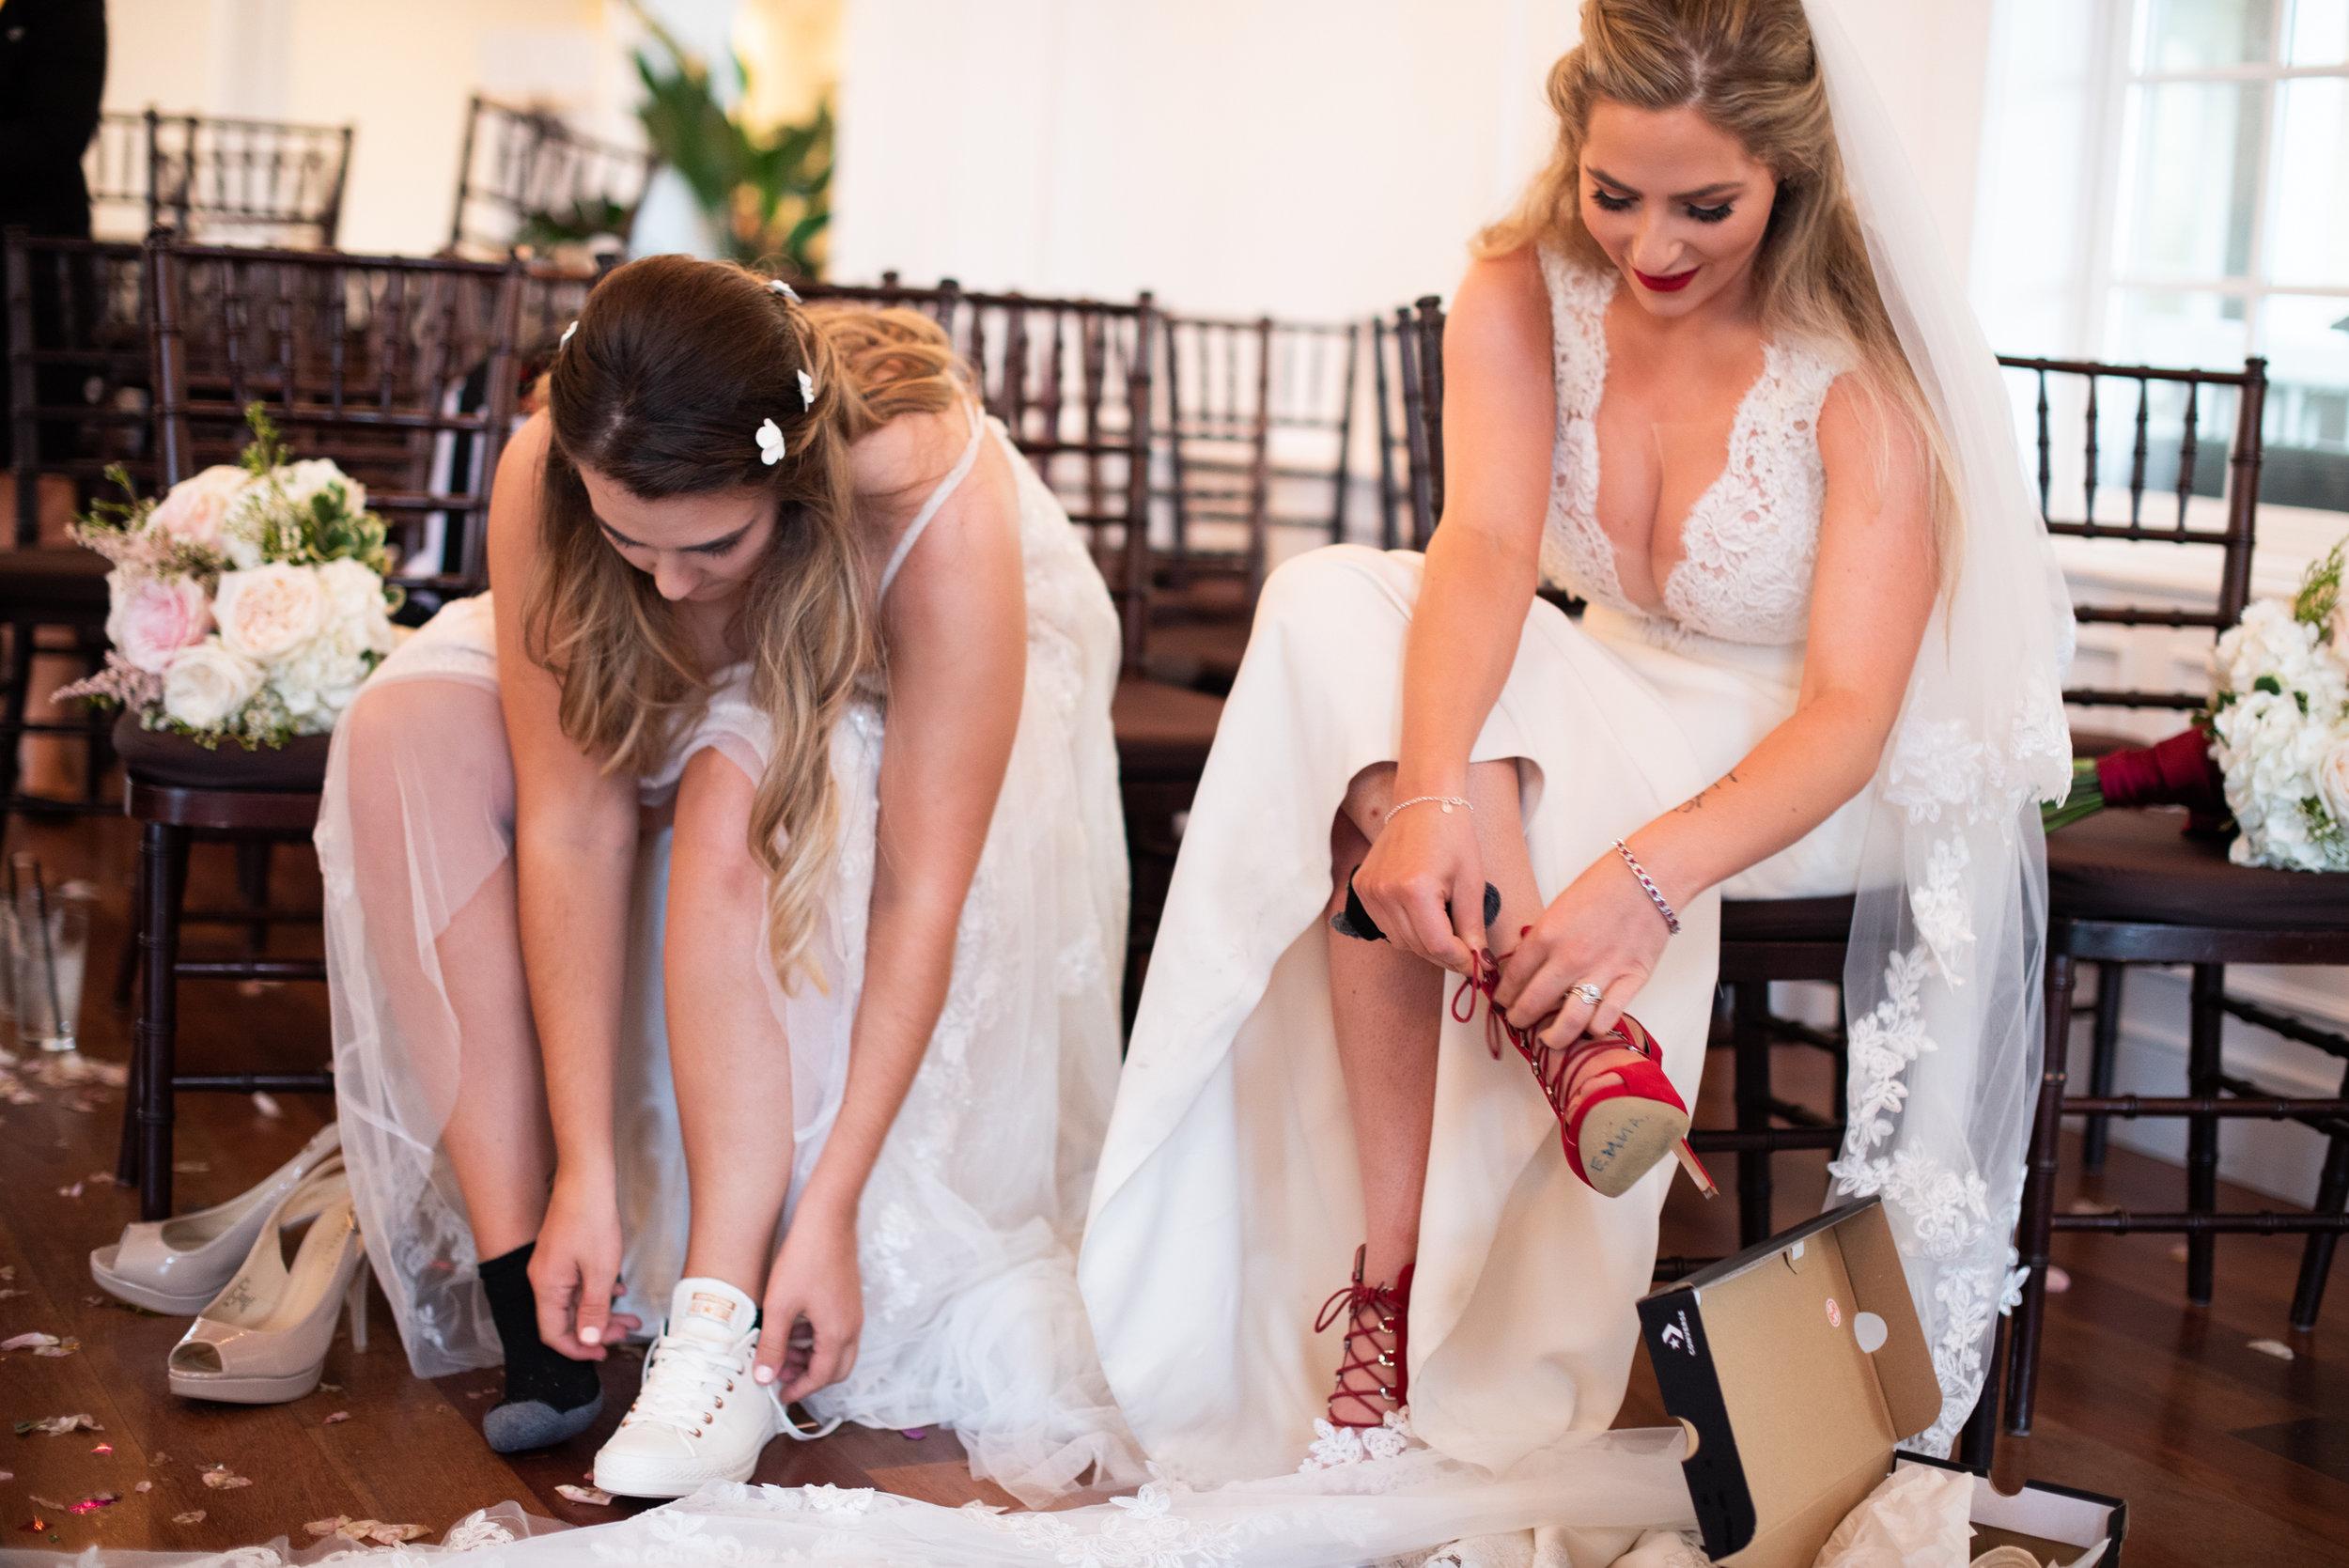 st-augustine-photographer-st-augustine-gay-wedding-sam-sex-wedding-photographer-sarah-annay-photography-white-room-weddings-35.jpg